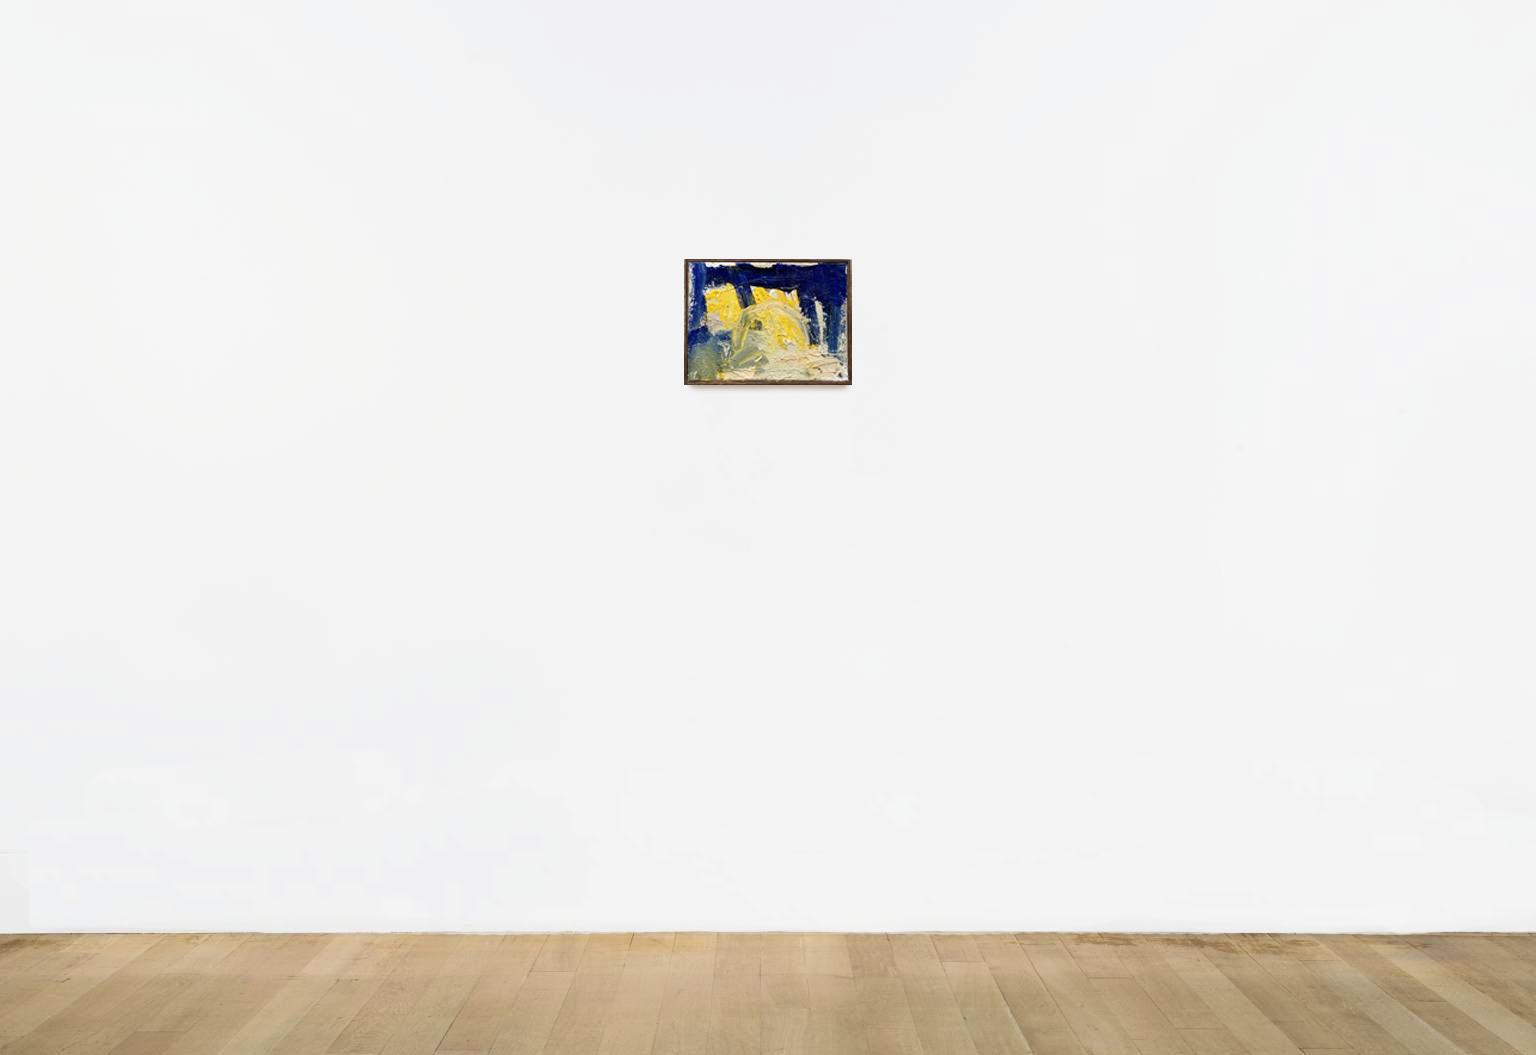 "UNDER THE BRIDGE - 2017Acrylic on canvas, gloss varnish, simple wood frame.12"" x 9"" (30cm x 22cm)•$300Inquire"